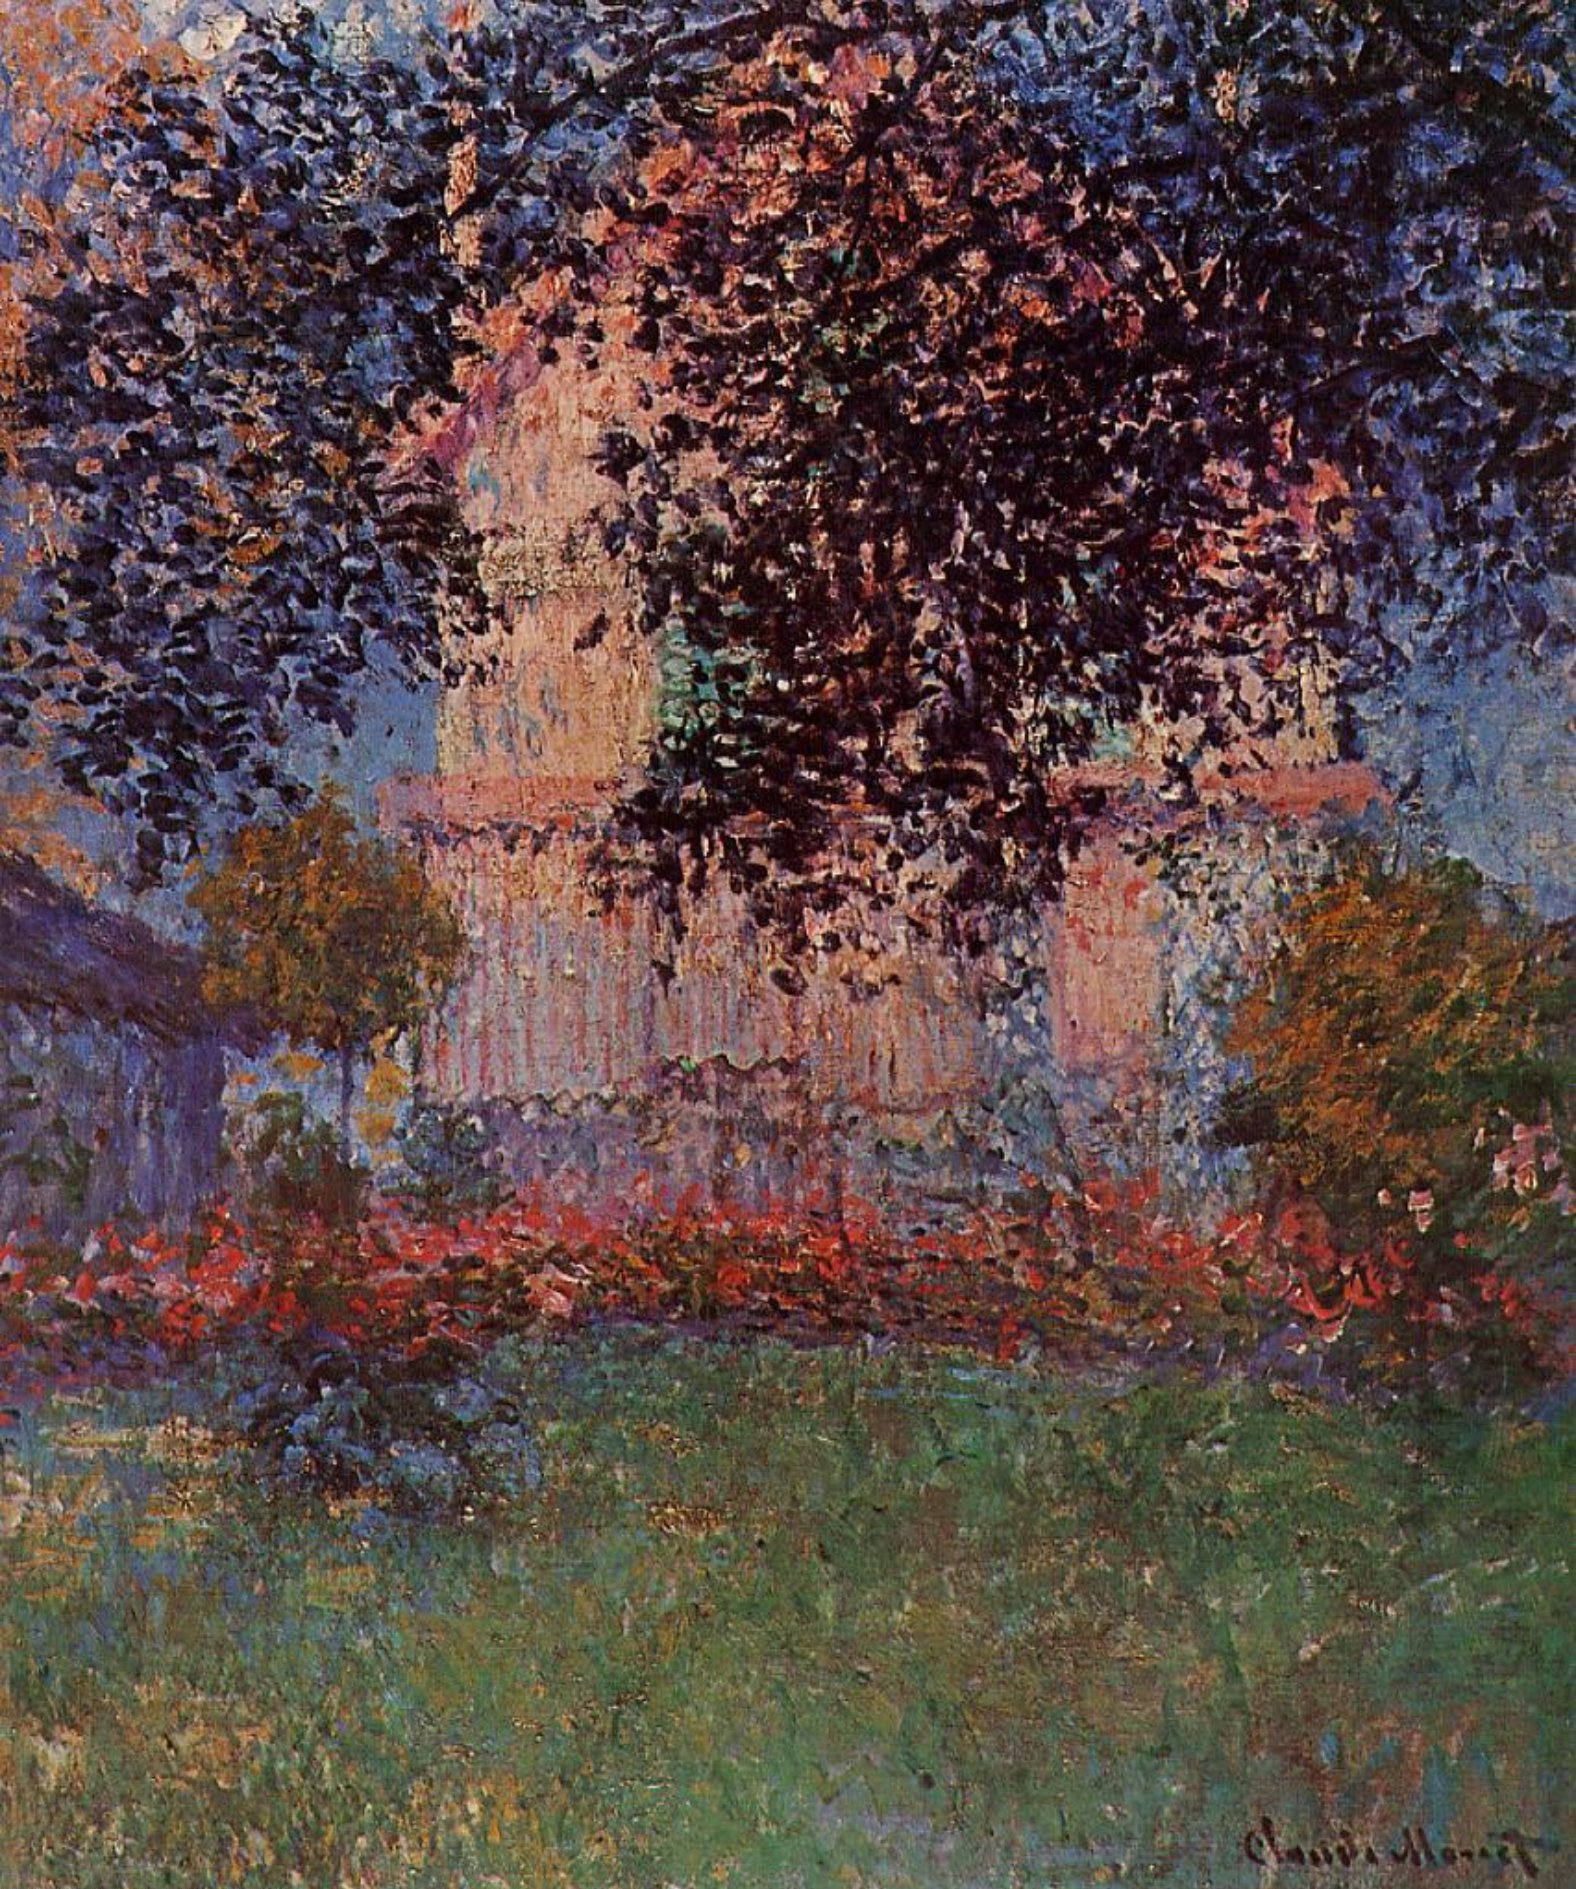 ������ < ��� ���� � �������� >:: ���� ����, �������� ������� - ���� ���� (Claude Monet) ����